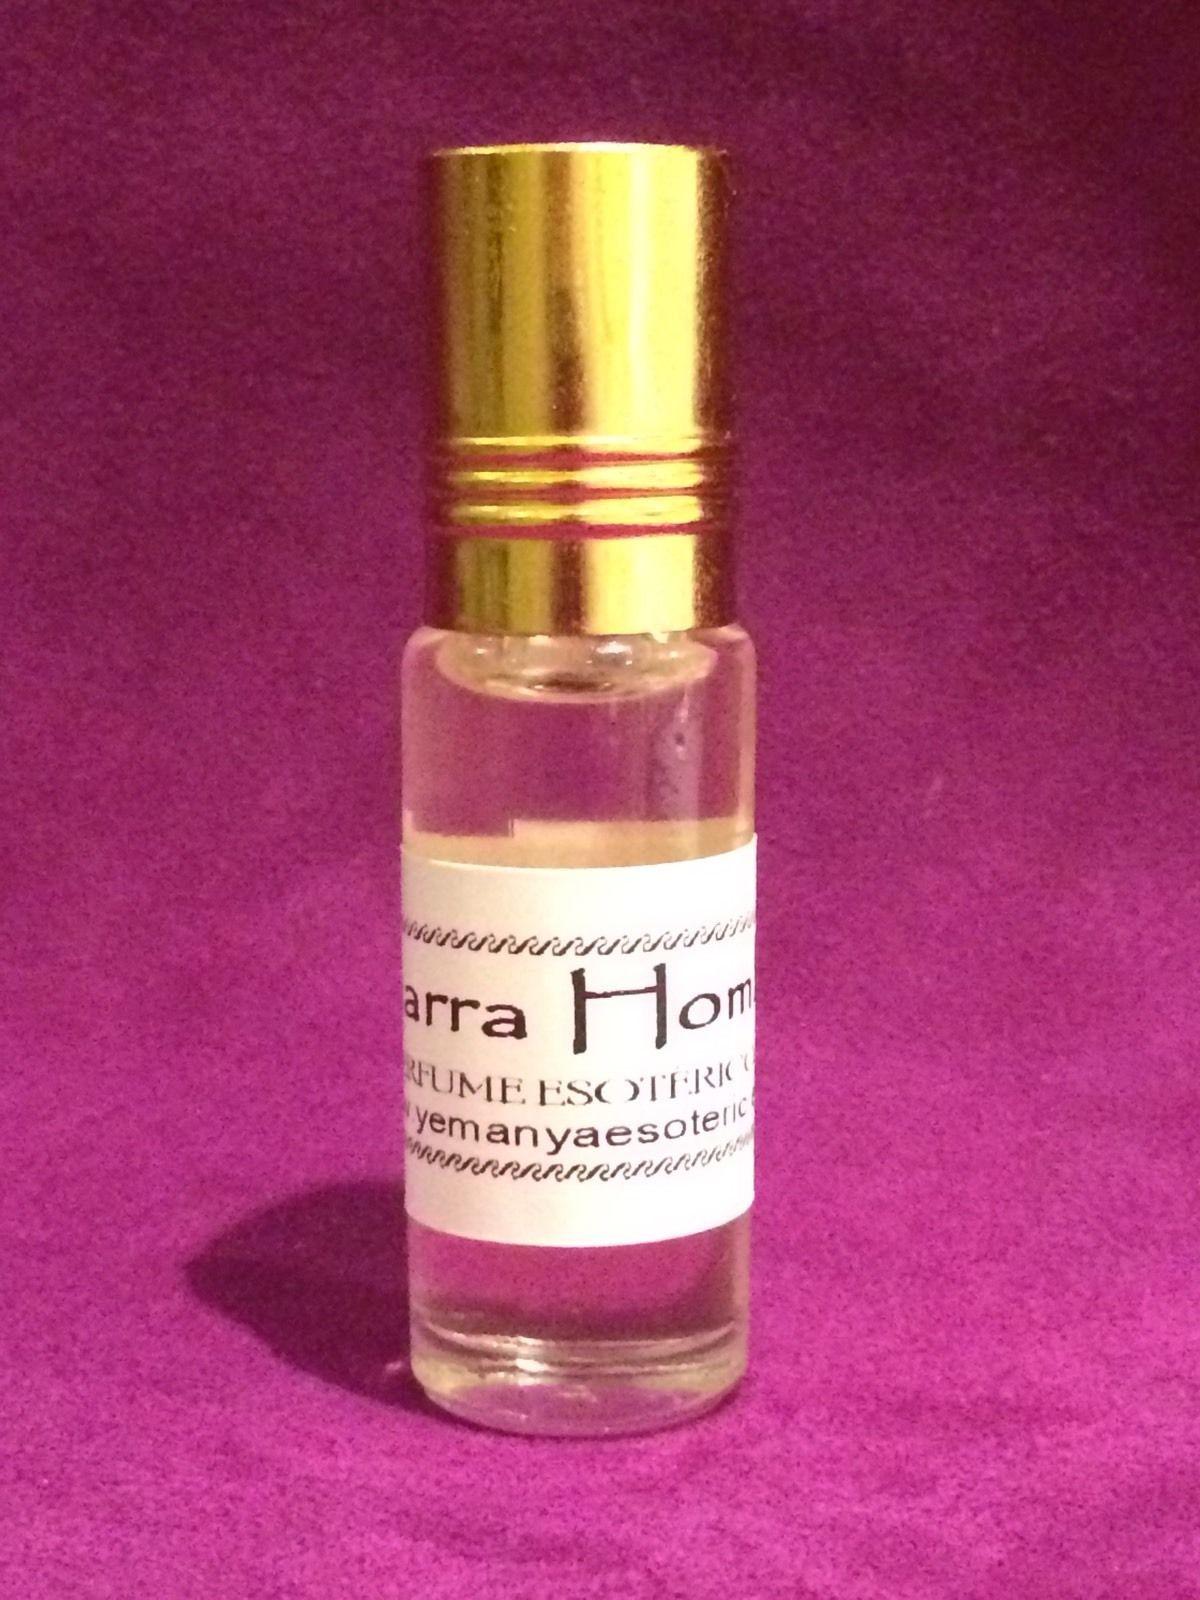 PERFUME ESOTERICO AMARRA HOMBRE 5 ml